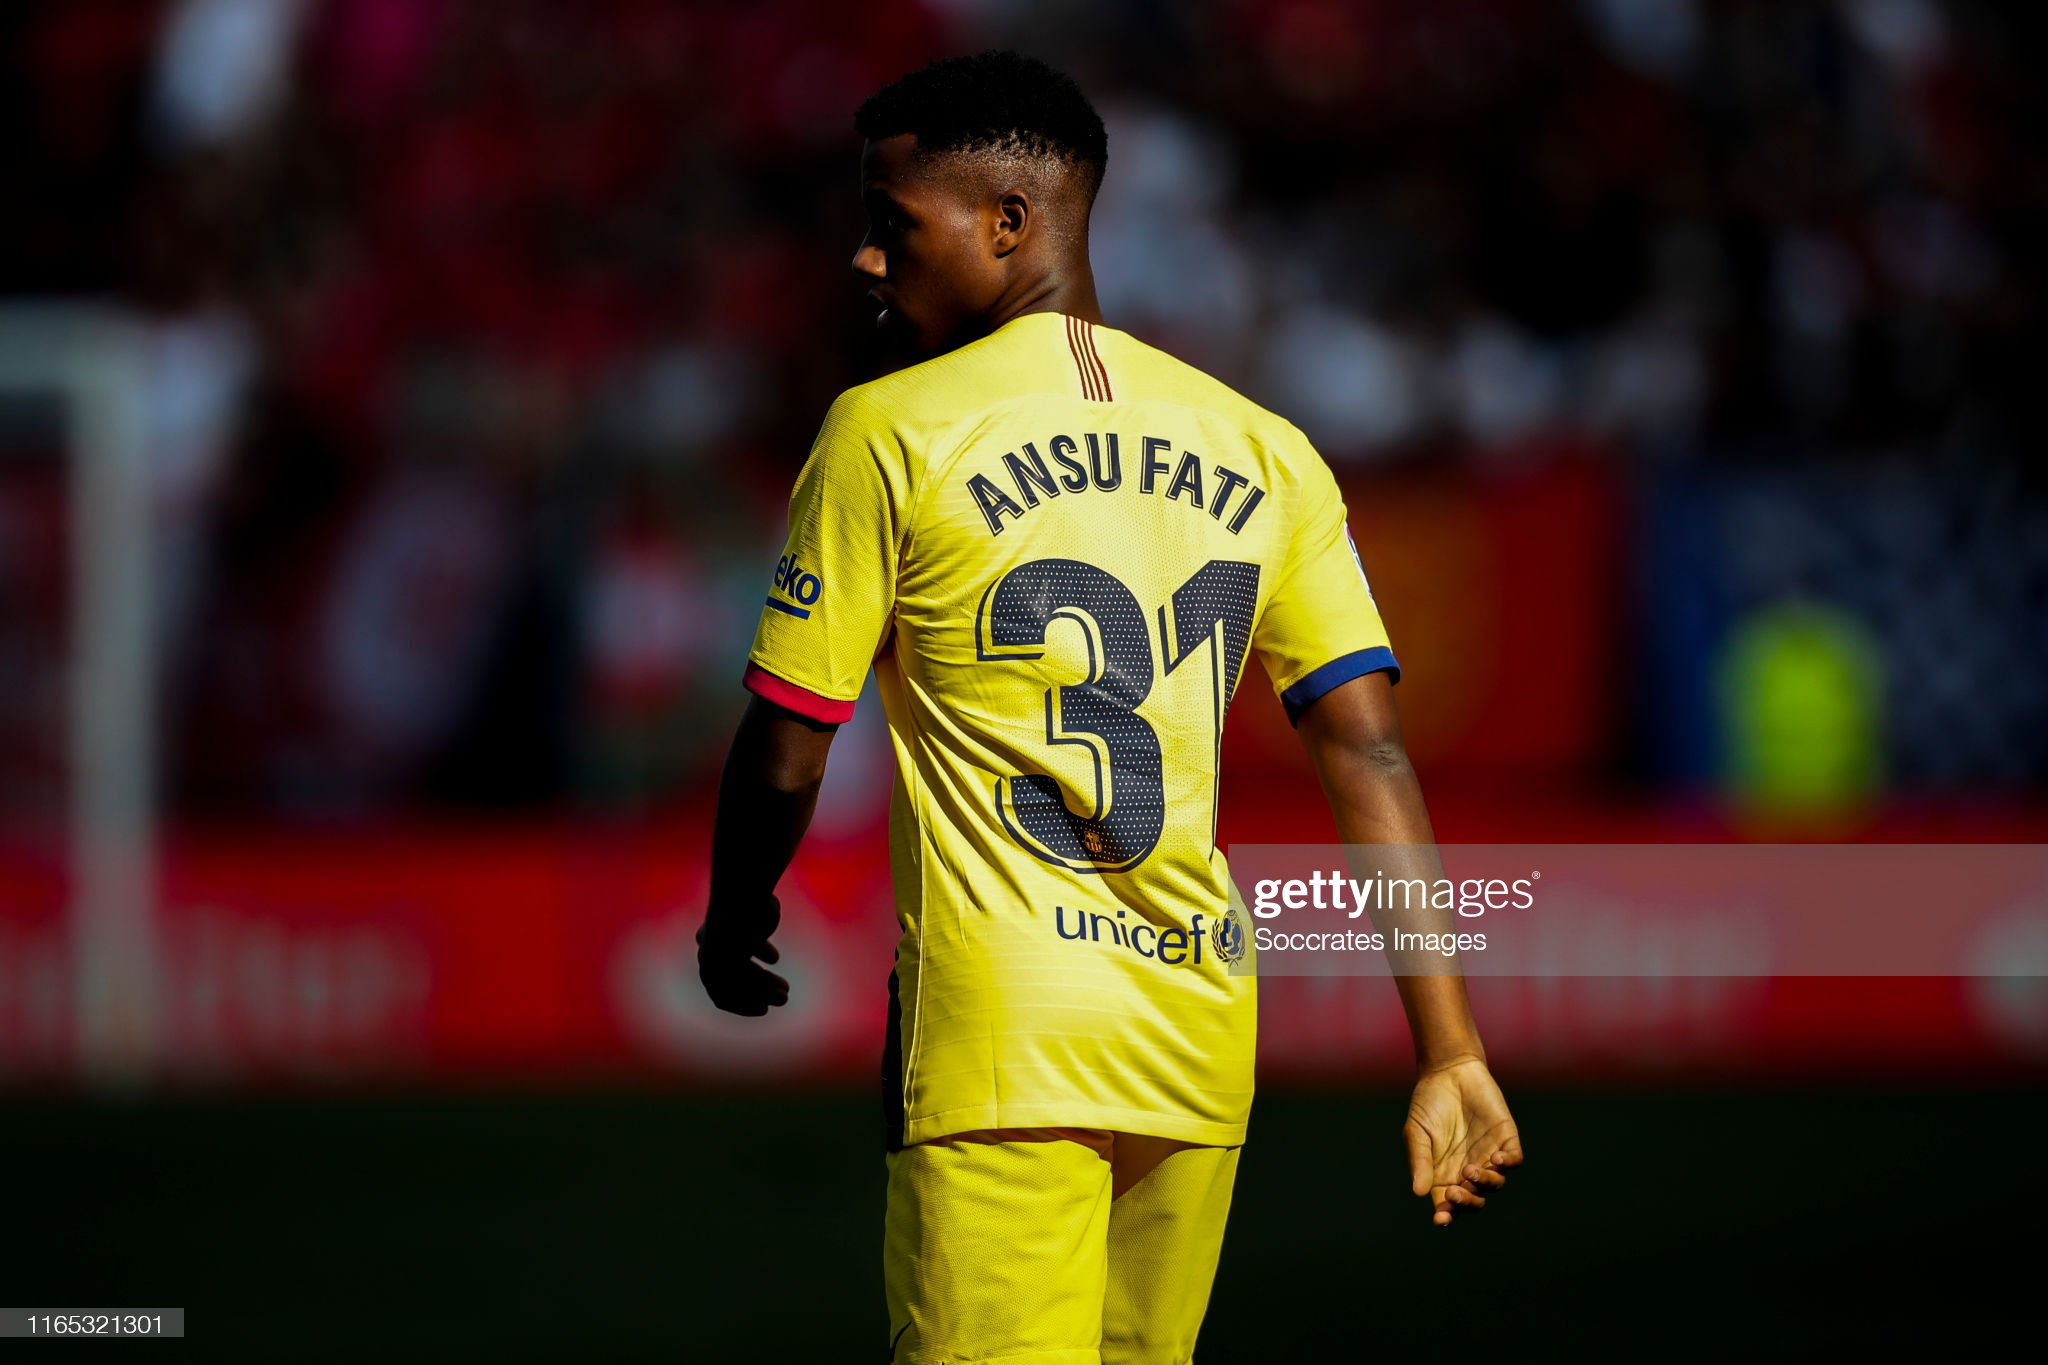 صور مباراة : أوساسونا - برشلونة 2-2 ( 31-08-2019 )  Ansu-fati-of-fc-barcelona-during-the-la-liga-santander-match-between-picture-id1165321301?s=2048x2048